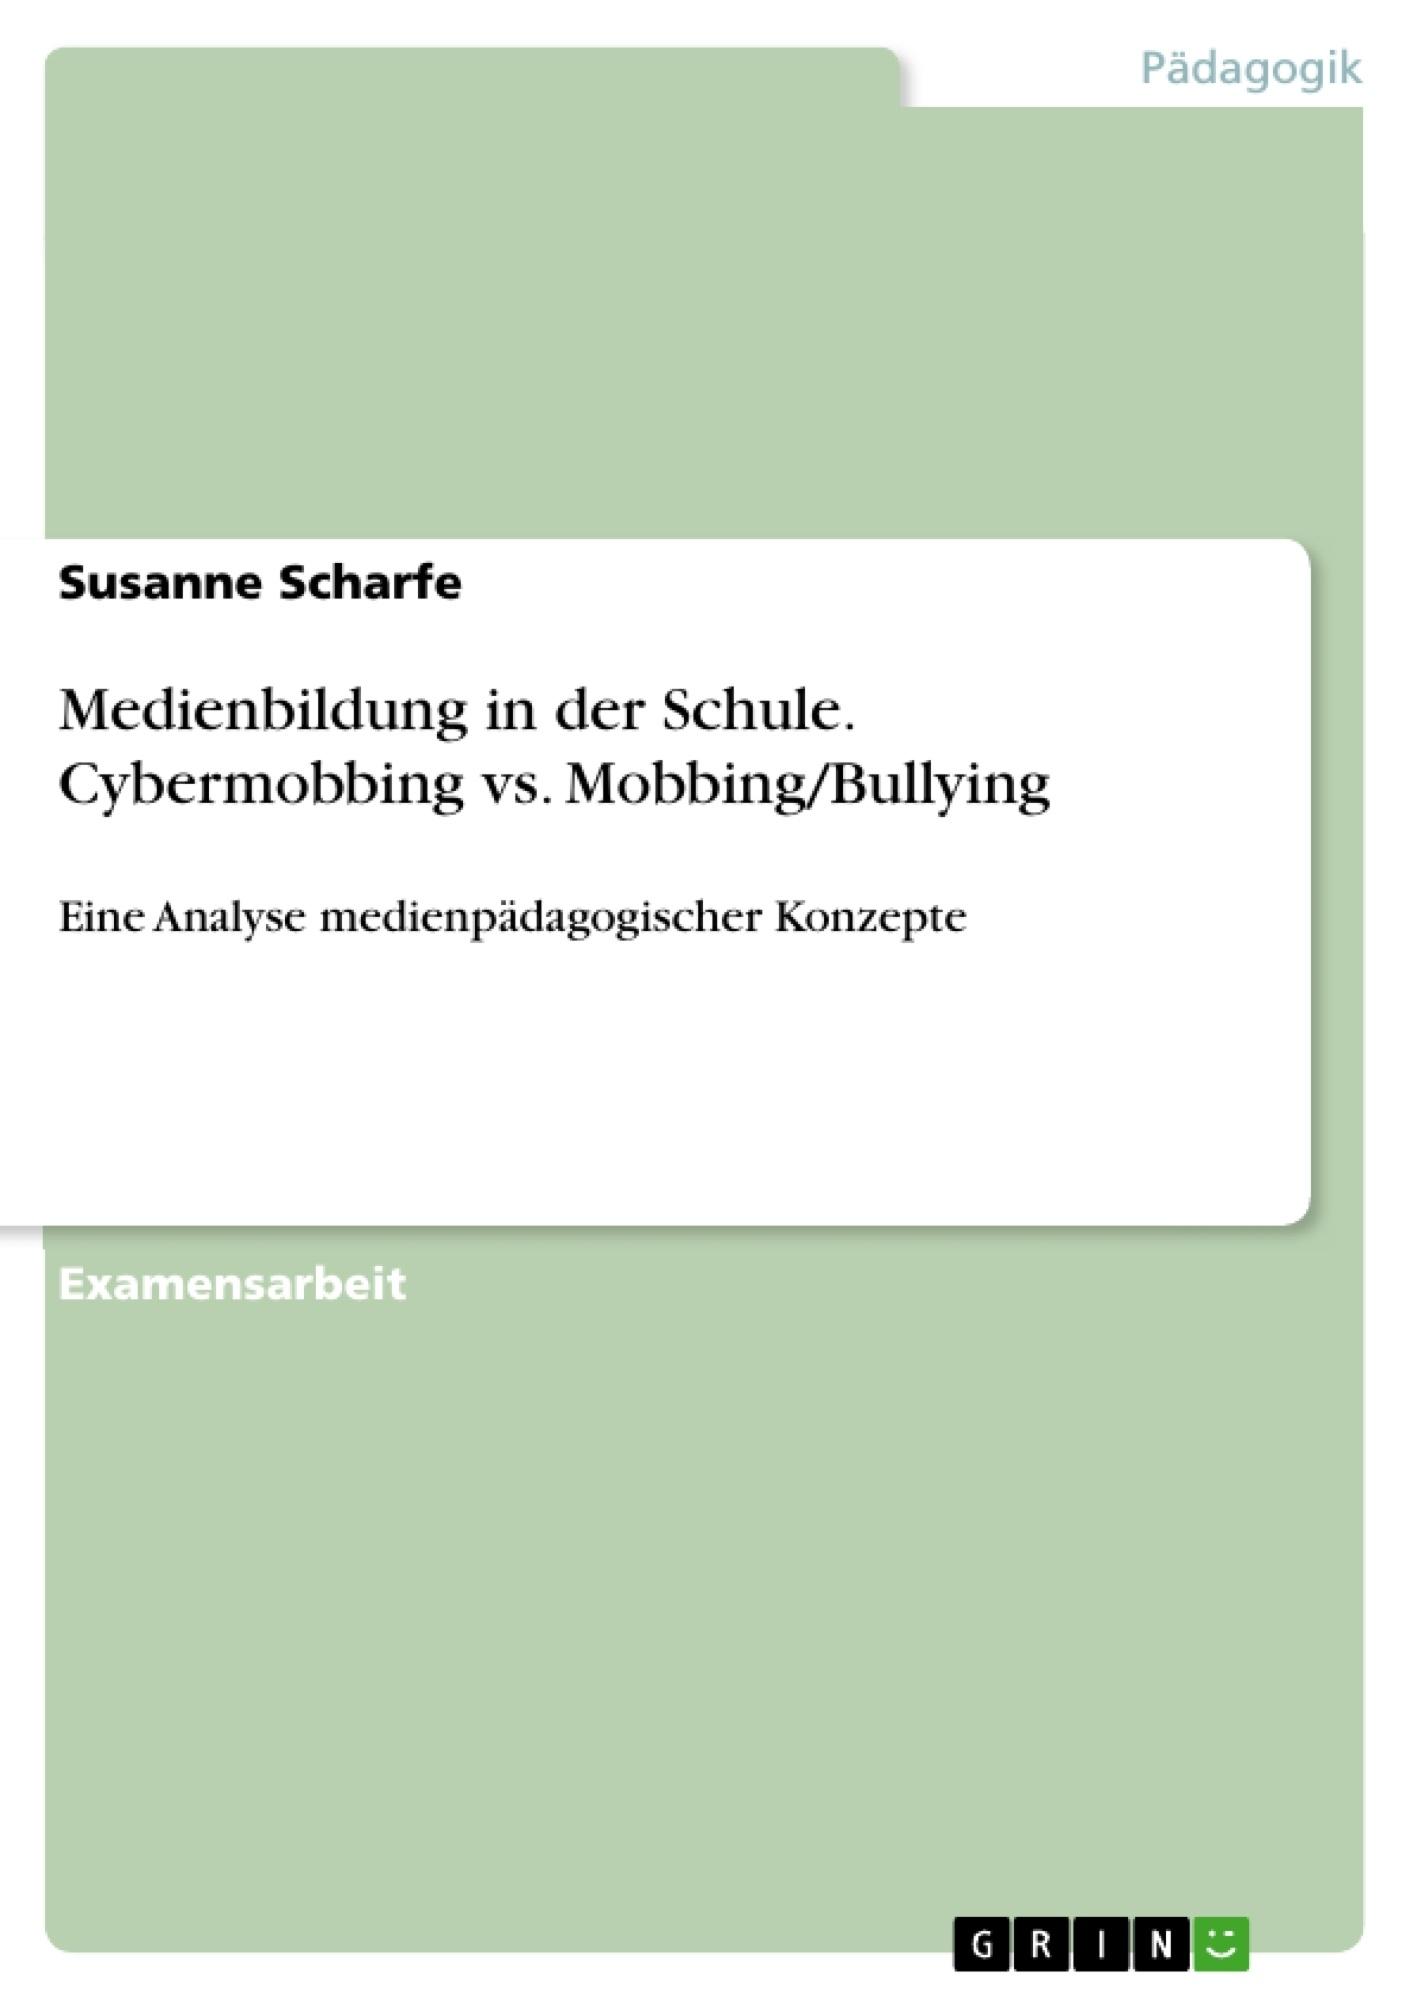 Titel: Medienbildung in der Schule. Cybermobbing vs. Mobbing/Bullying